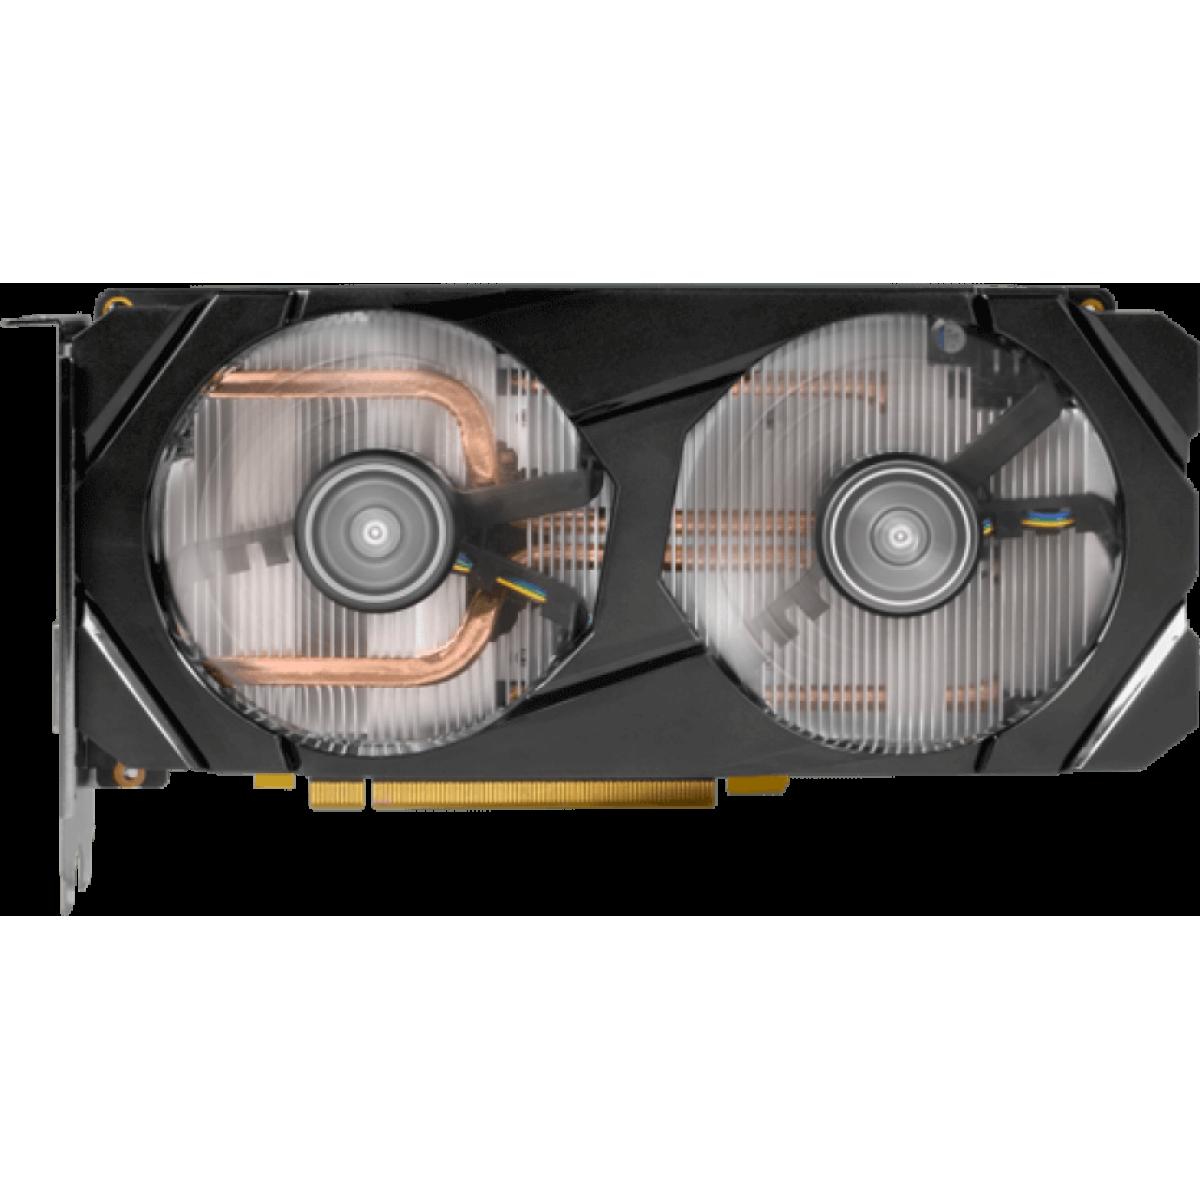 Placa de Vídeo Galax Geforce RTX 2060 OC Dual, 6GB GDDR6, 192Bit, 26NRL7HPX7OC